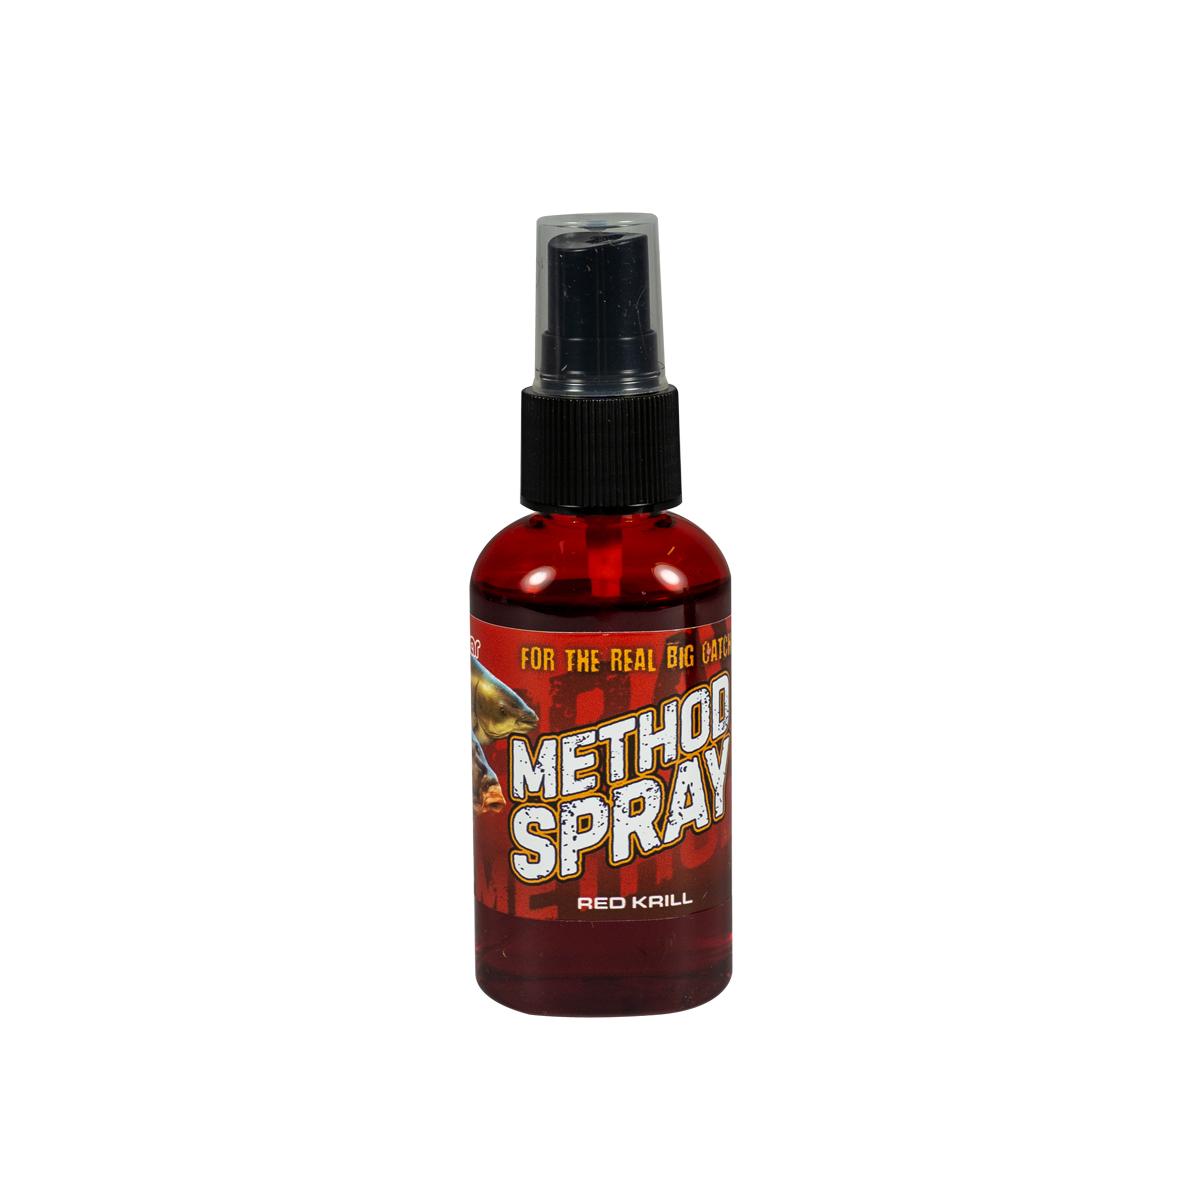 BENZAR MIX Method Spray - ČERVENÝ KRILL (50ml)